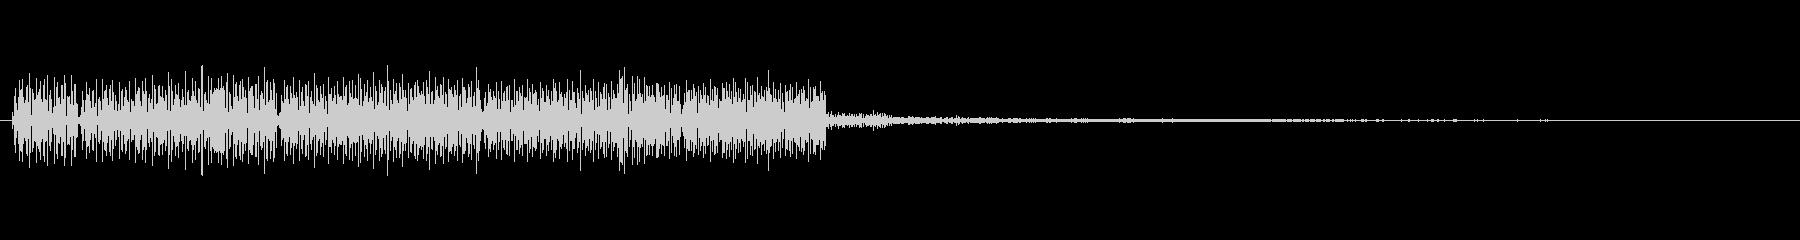 RPG等の魔法の攻撃音風の音の未再生の波形